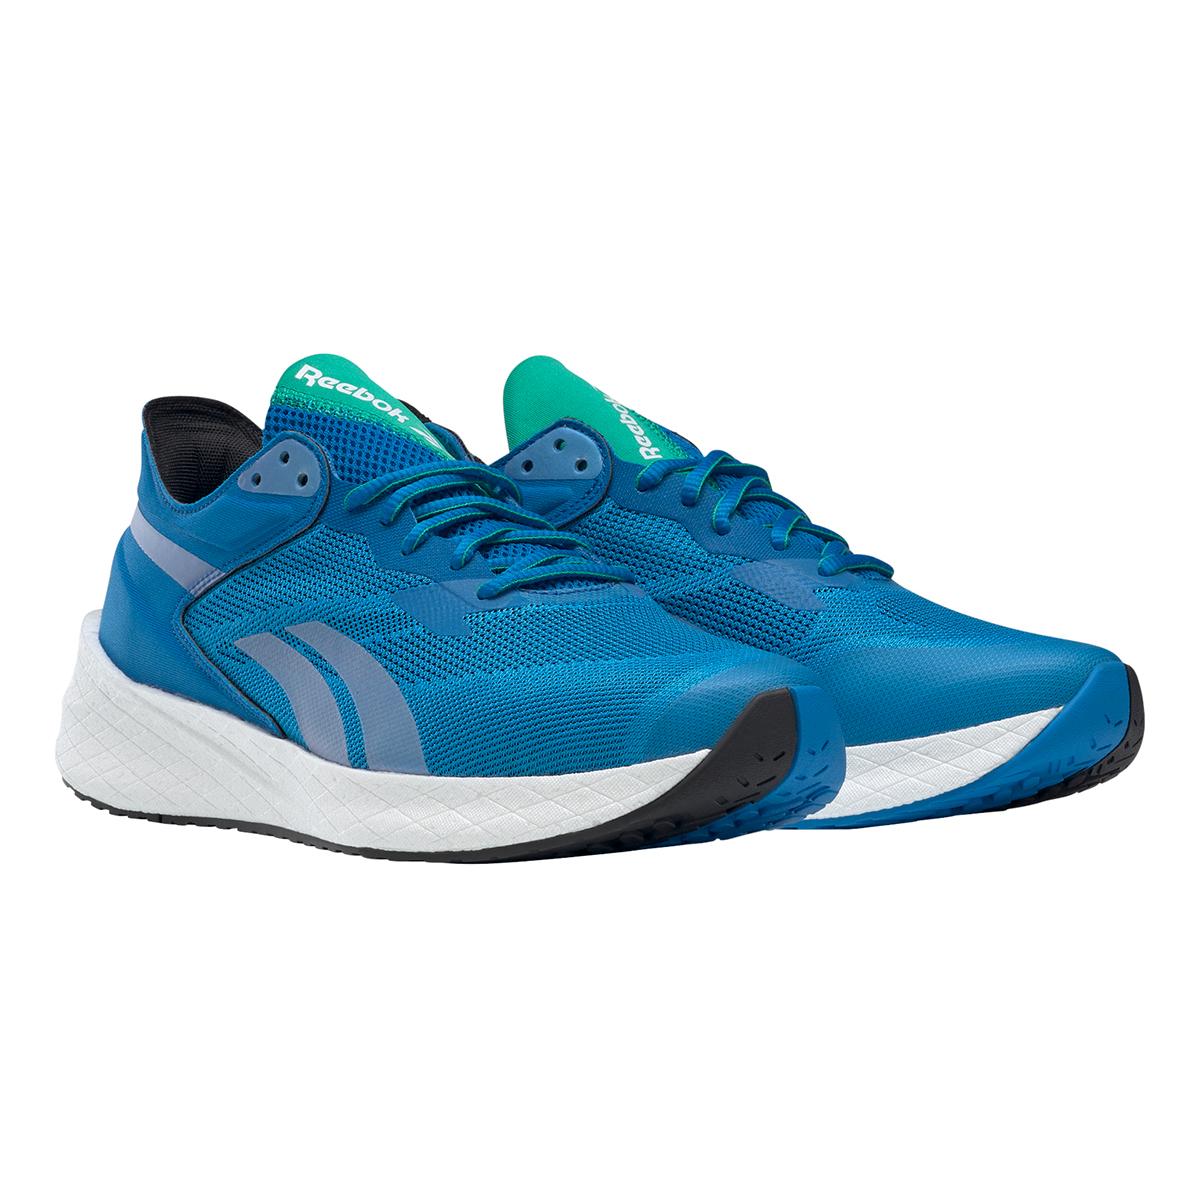 Men's Reebok Floatride Energy Symmetros Running Shoe - Color: Dynamic Blue/Horizon Blue/Court Green - Size: 7 - Width: Regular, Dynamic Blue/Horizon Blue/Court Green, large, image 3